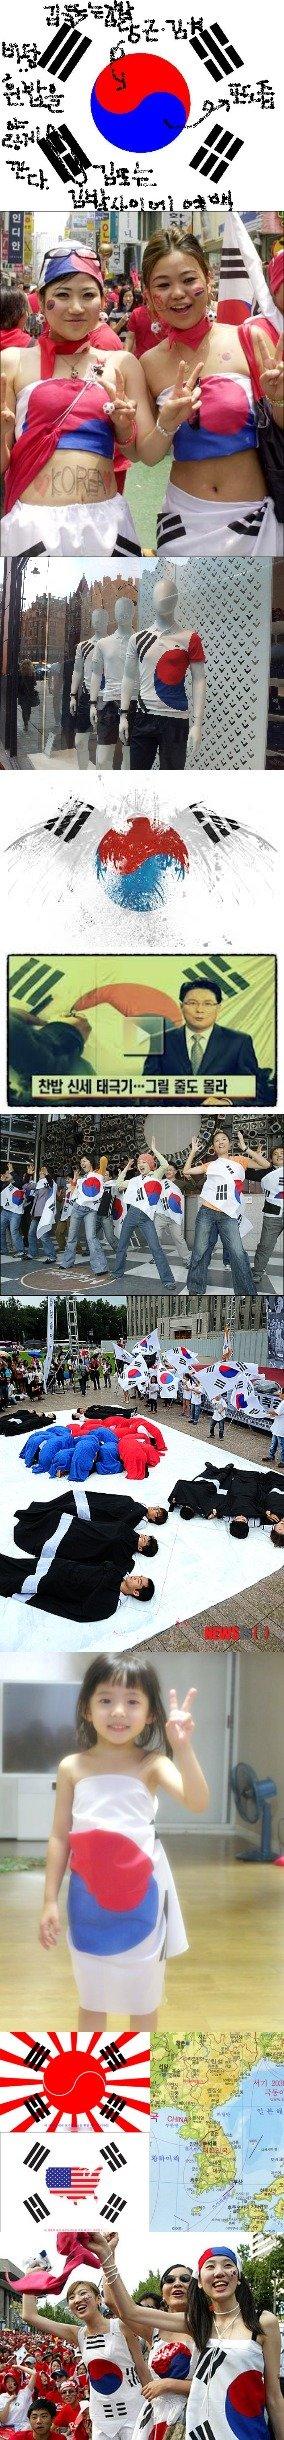 patriotic korean cute girls. I love my country 온나라 국기중에 가장기분나쁘게 생긴건 태극기라고 생각한다. 어디 걸어놔도 멋도 안나고 옷처럼 두르고 다니면 챙피하기만하다. 부칸인공기 둘르고 다니는게 뽀대나더라ㅆㅍ. 냉증환자 김치년들은 생리하다 옷에 묻 Korean history korean drama Korean fashion Korean cuisine korean food Korean flag korea Gwangju